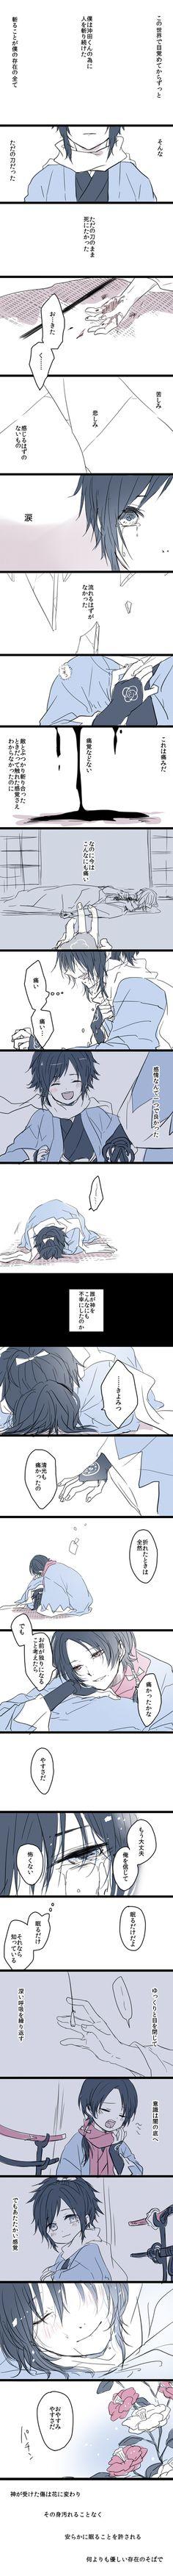 Kashuu vs Yamato